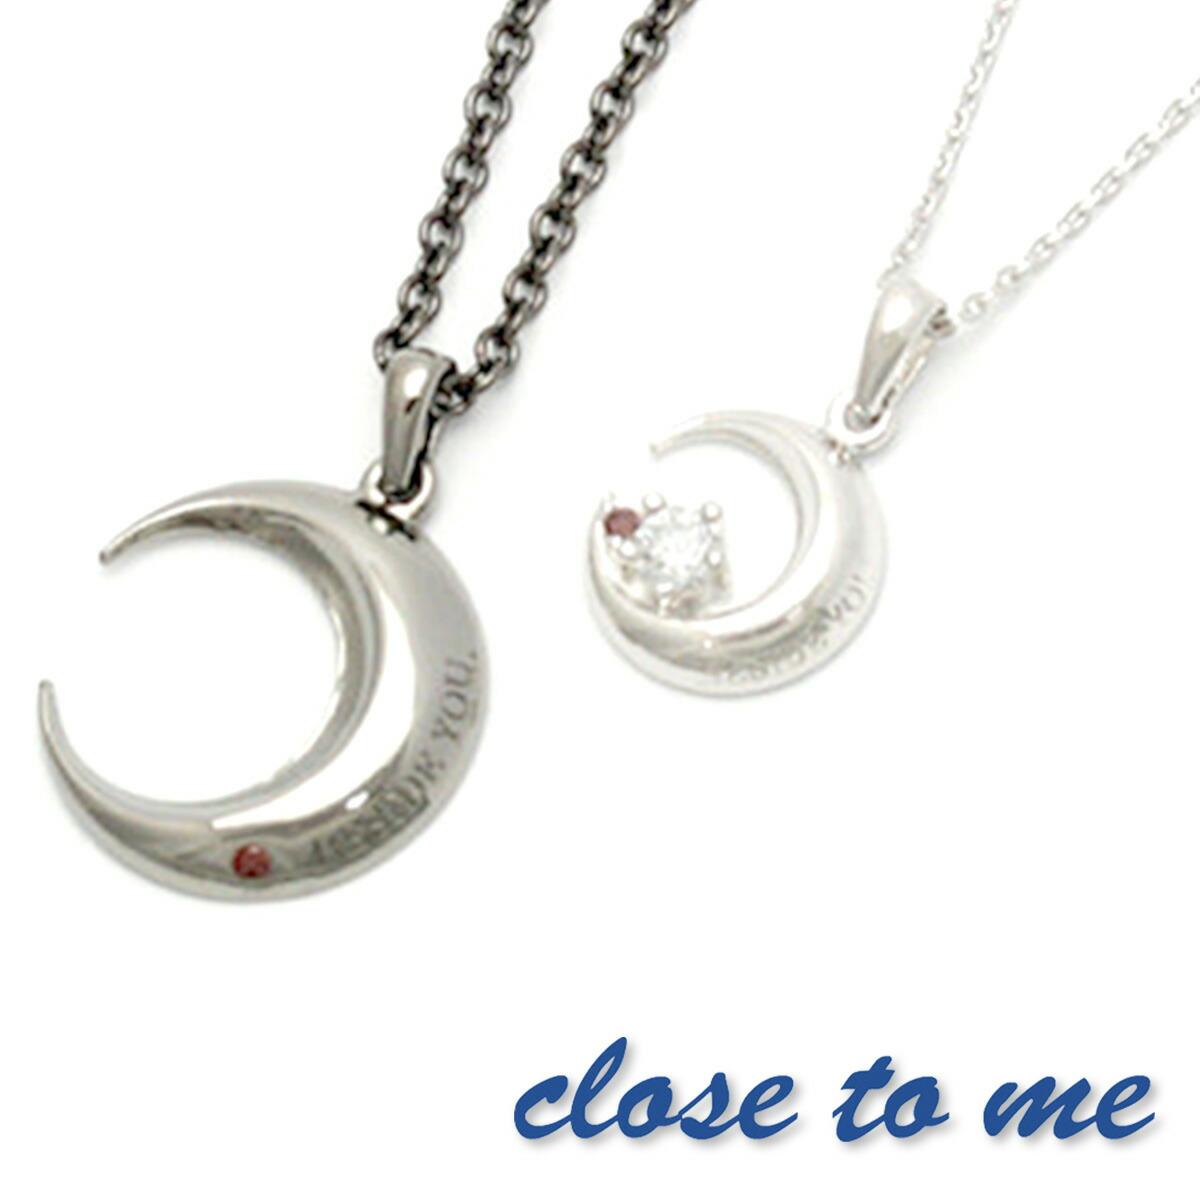 close to me/クローストゥーミー REDダイヤ クレッセント ペアネックレス SN13-171-172【刻印無料】